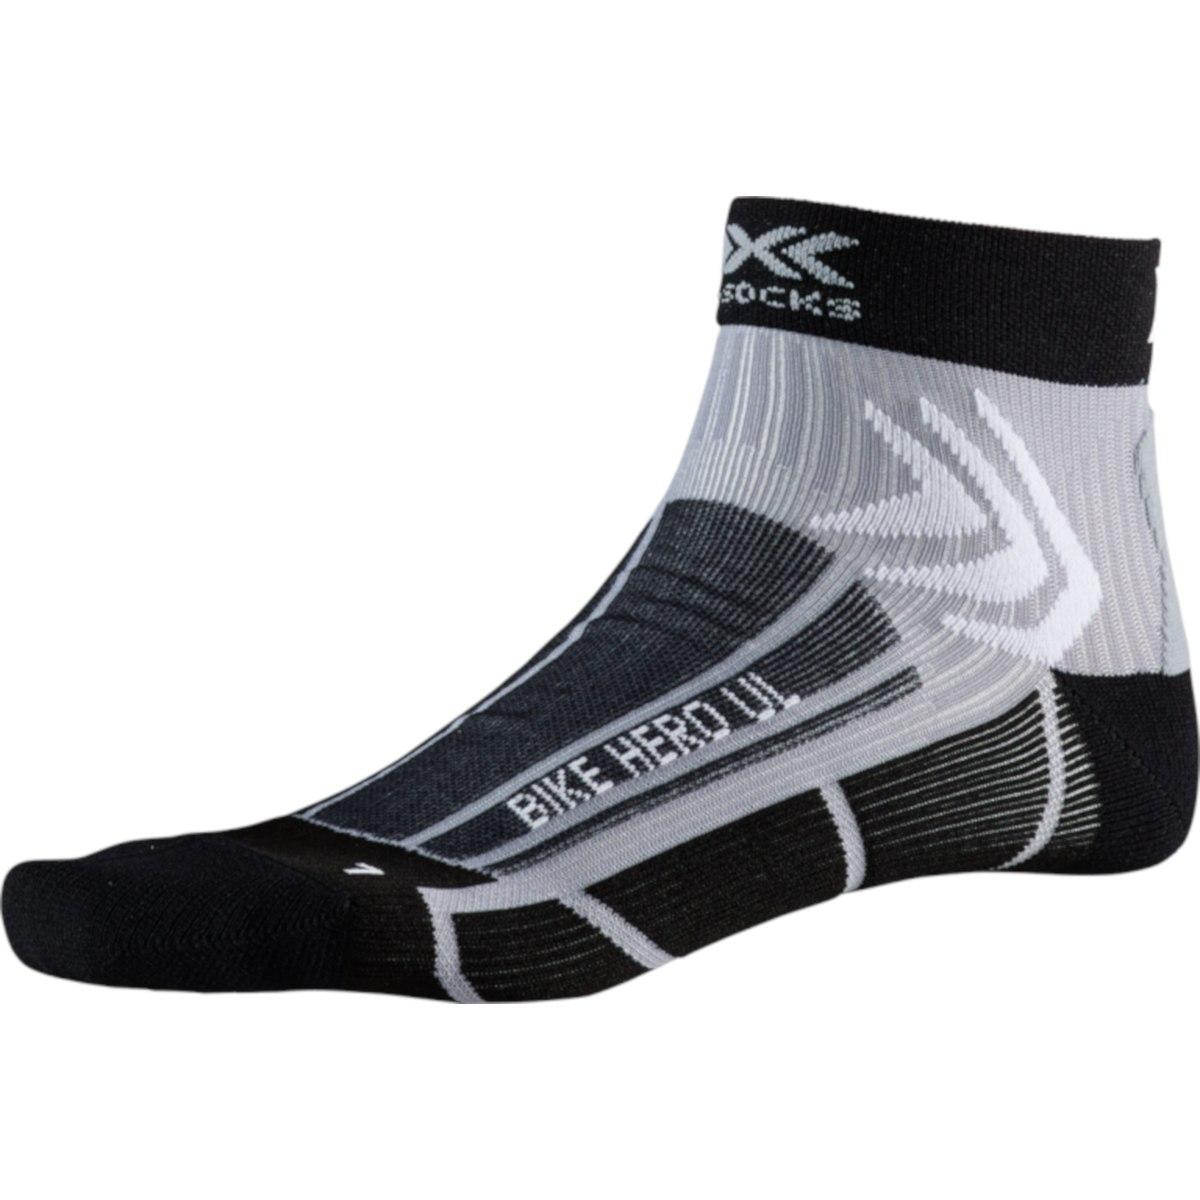 X-Socks Bike Hero UL Socken - opal black/dolomite grey